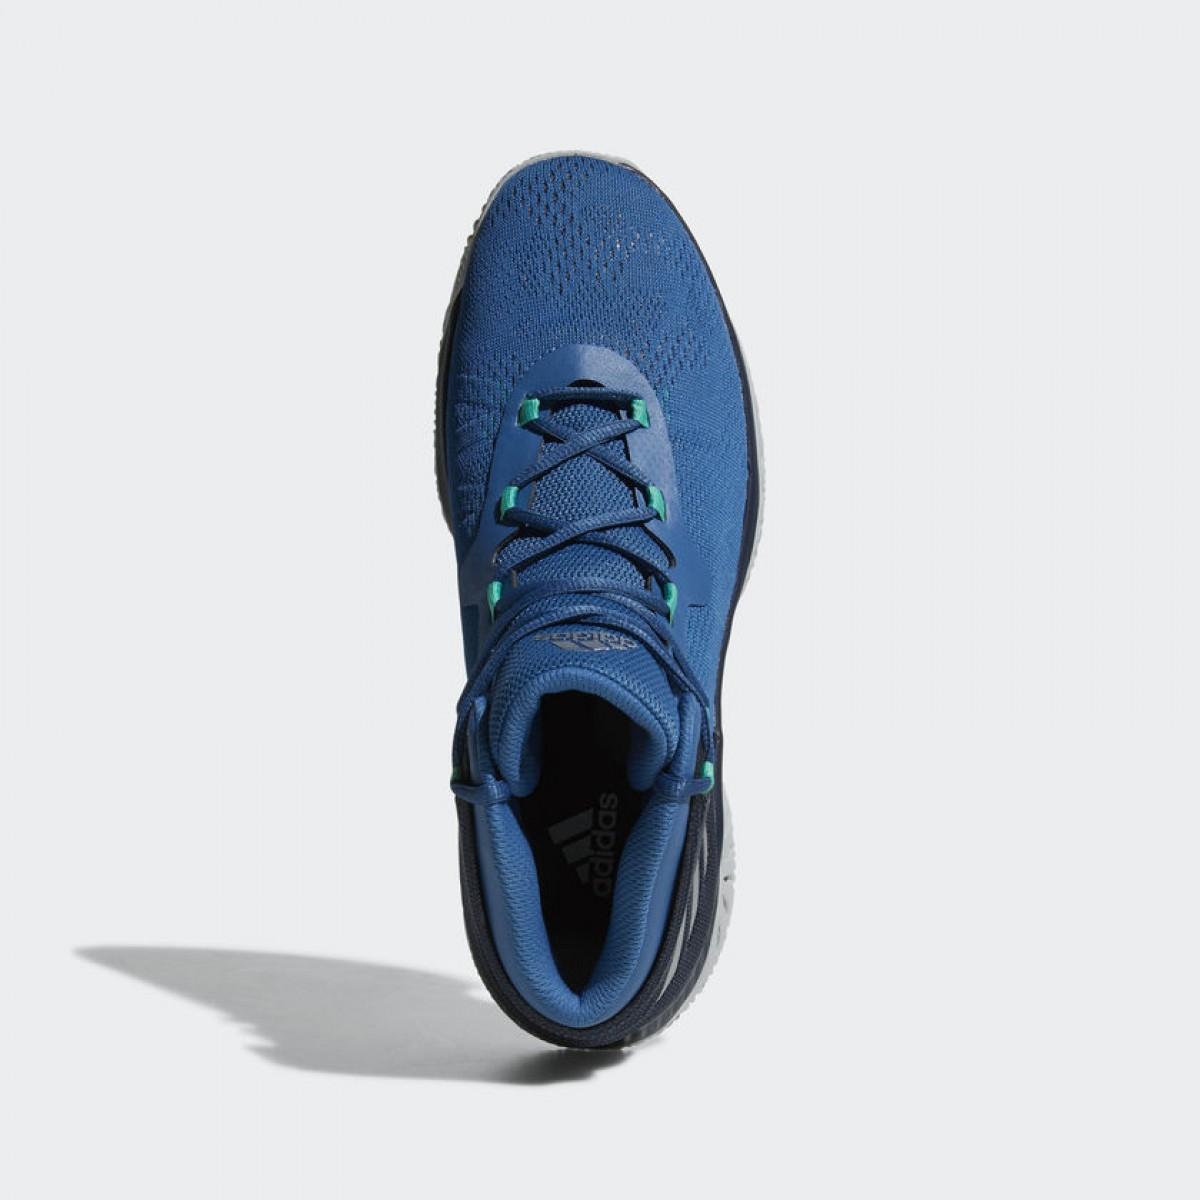 Adidas Explosive Bounce 'Navy' CQ0213